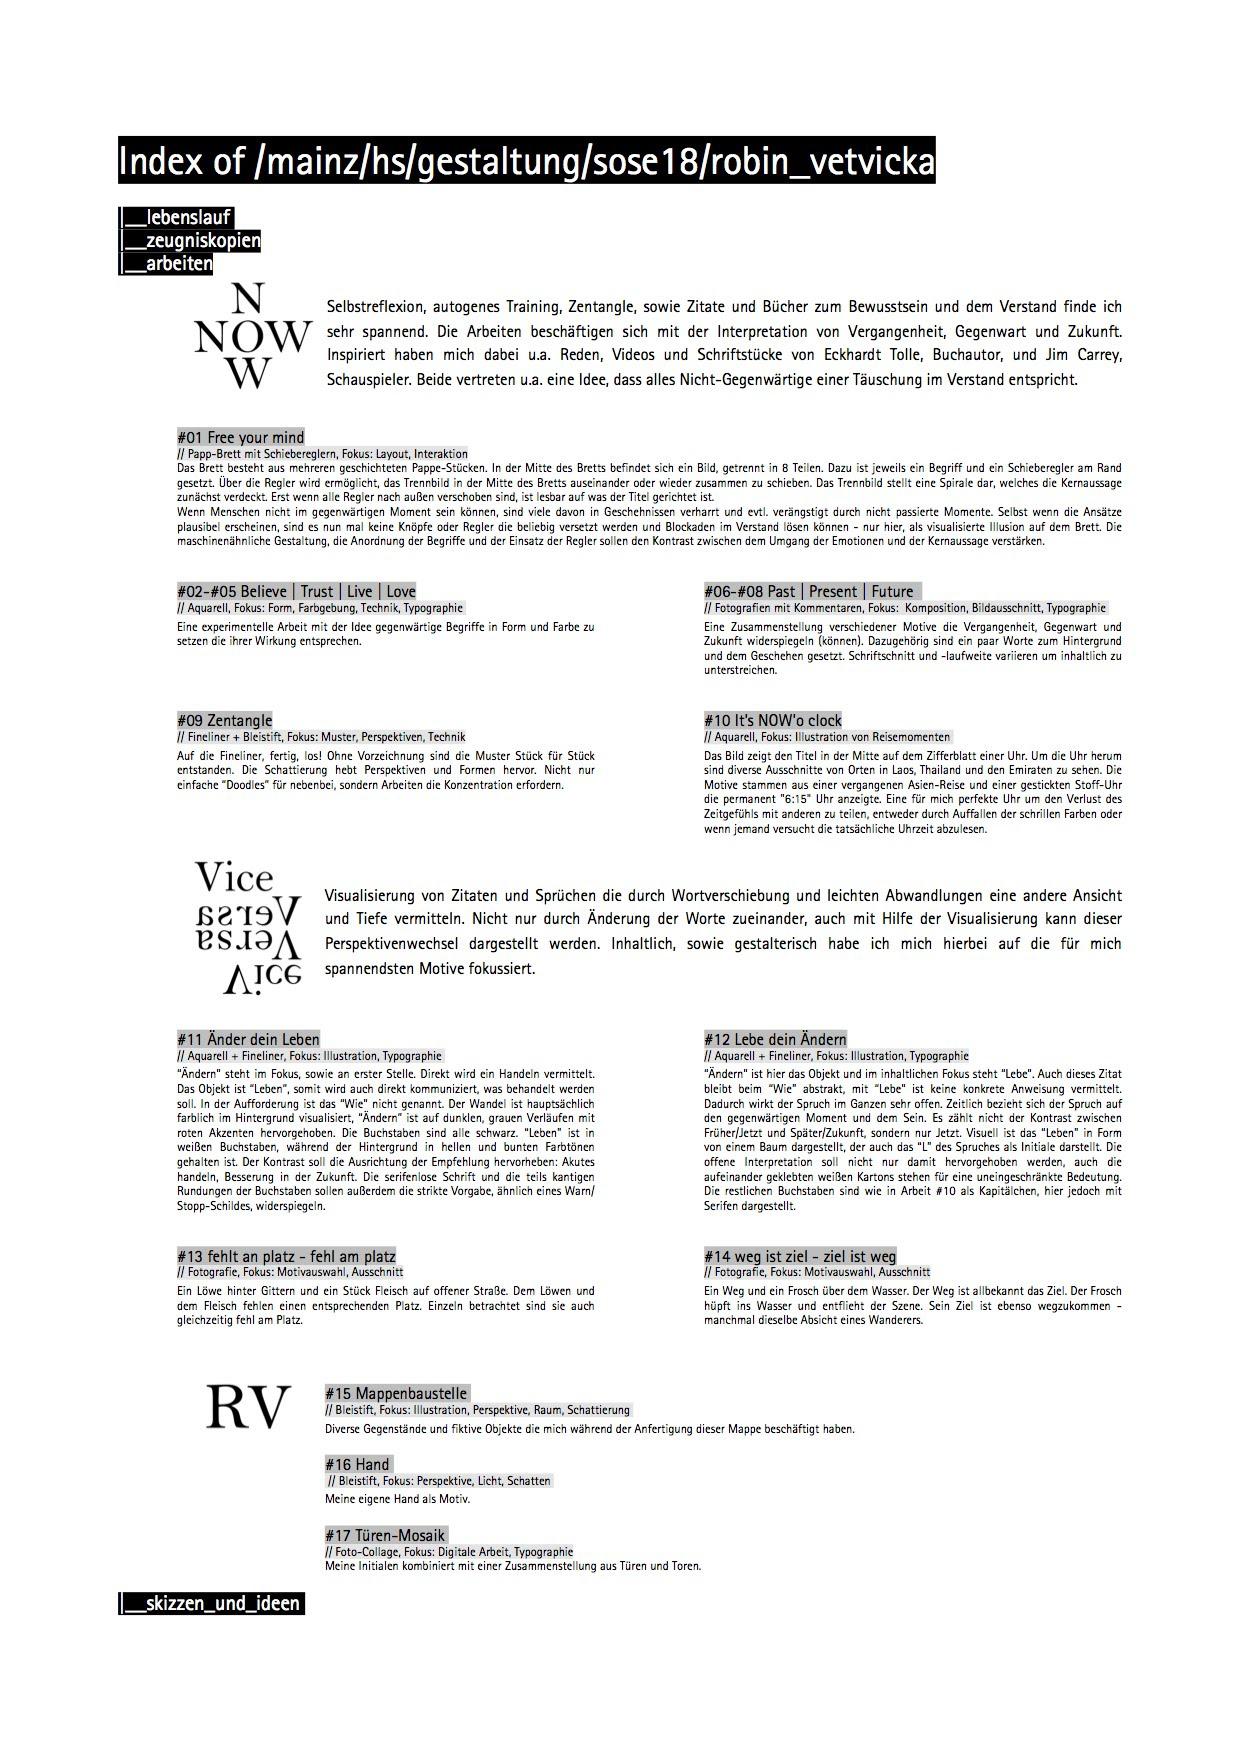 NOW | Vice Versa | RV | precore.net